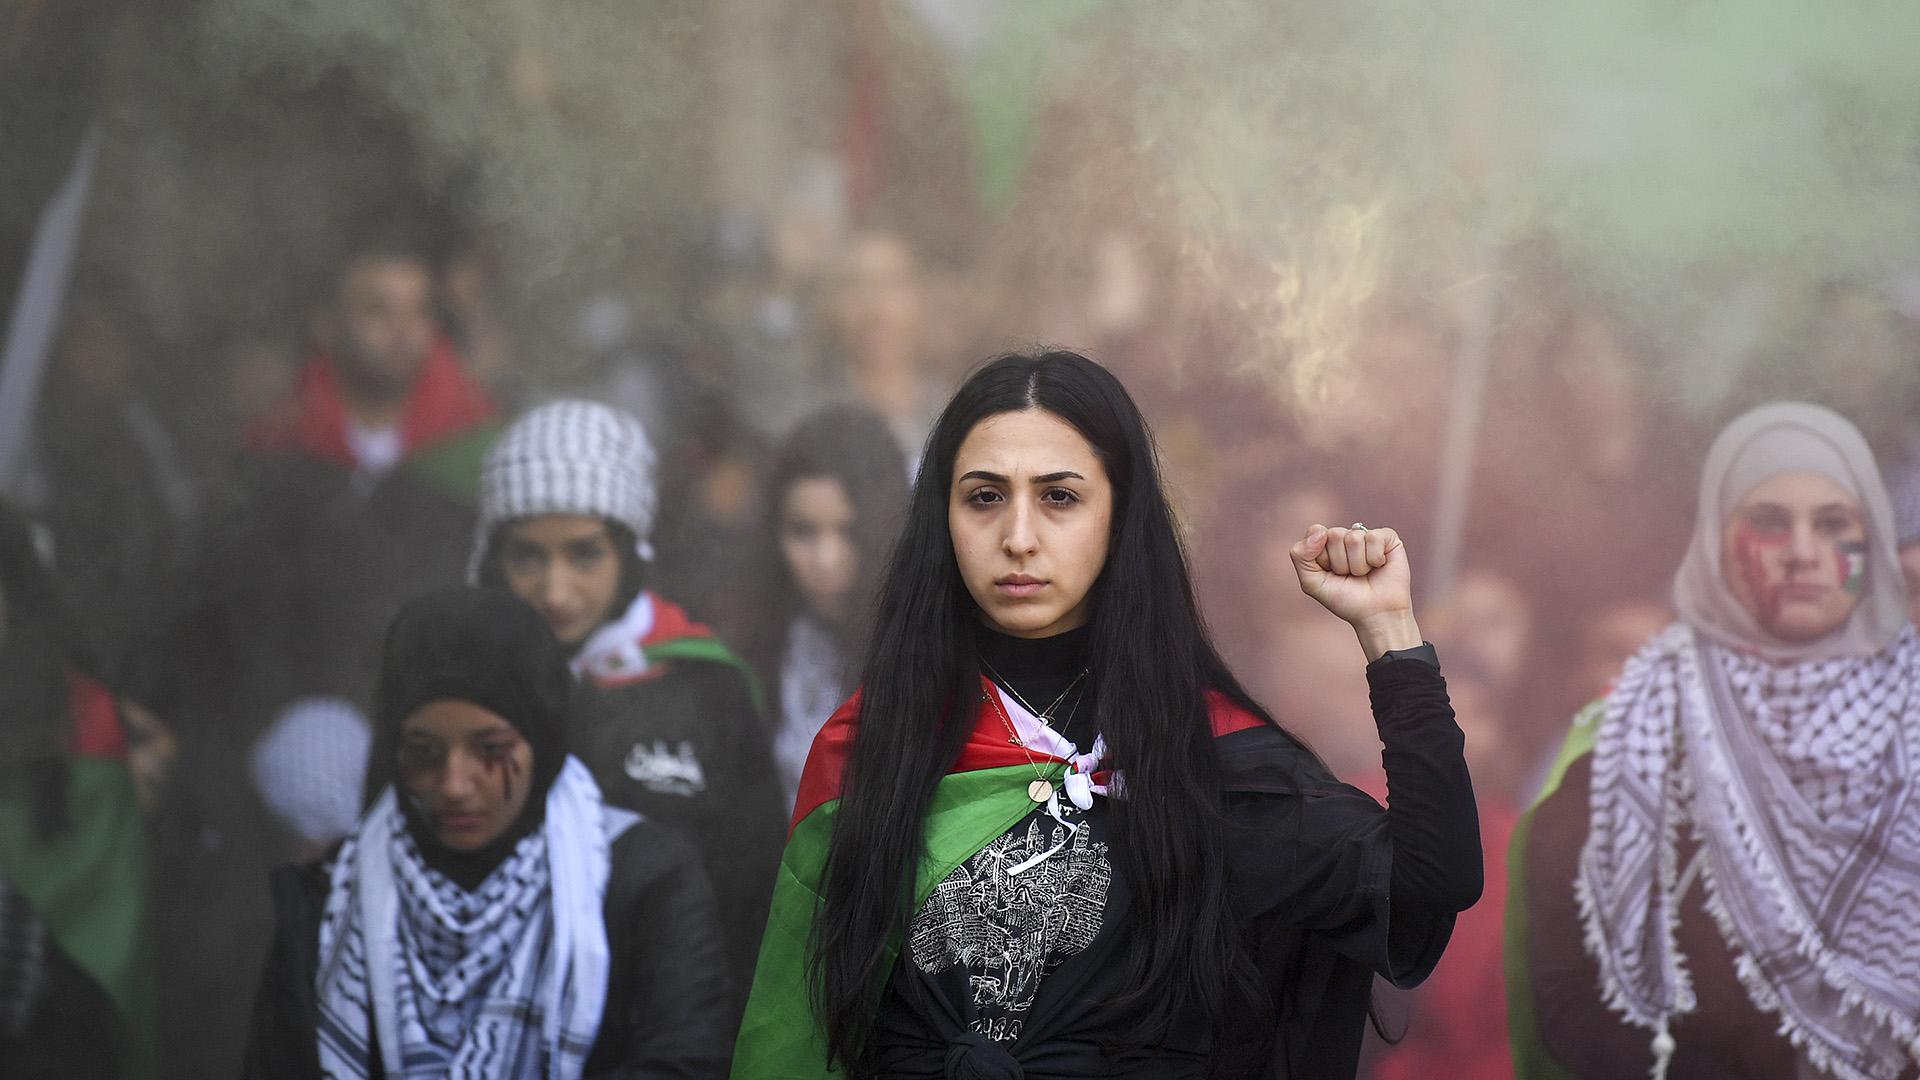 Gaza Violence Sparks Capital City Rallies In Australia